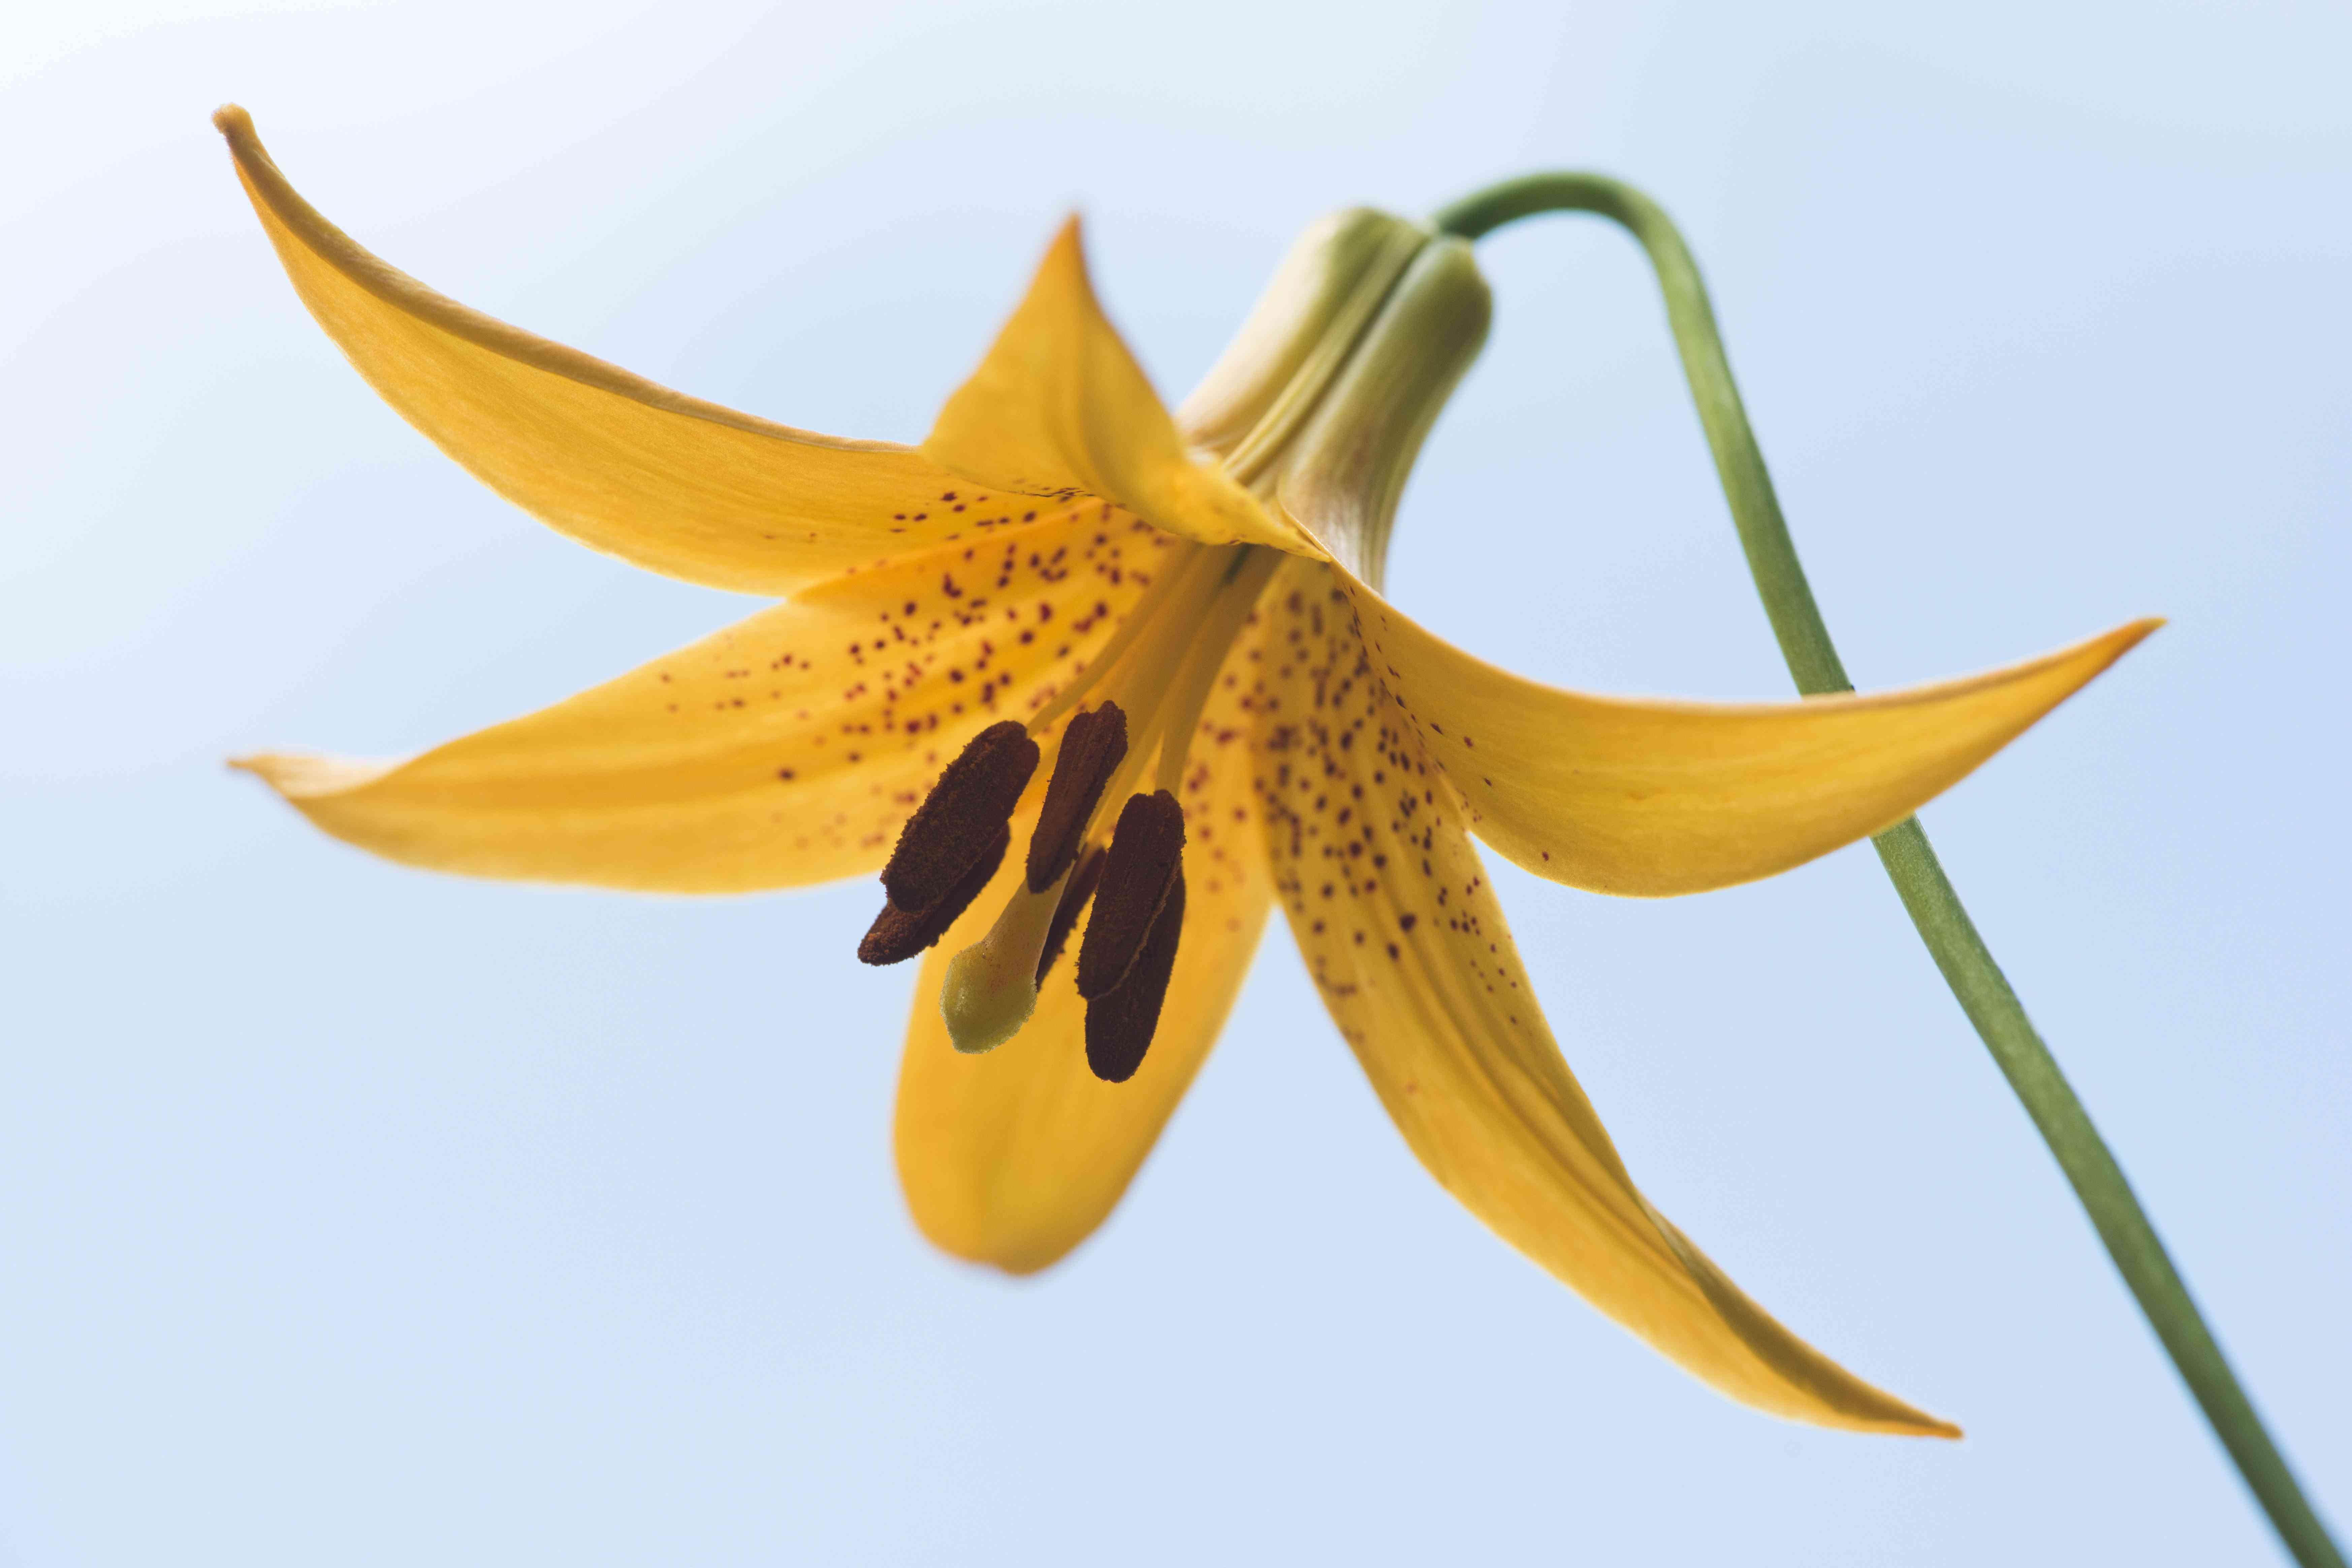 Wild yellow lily (Lilium canadense), Emsland, Lower Saxony, Germany